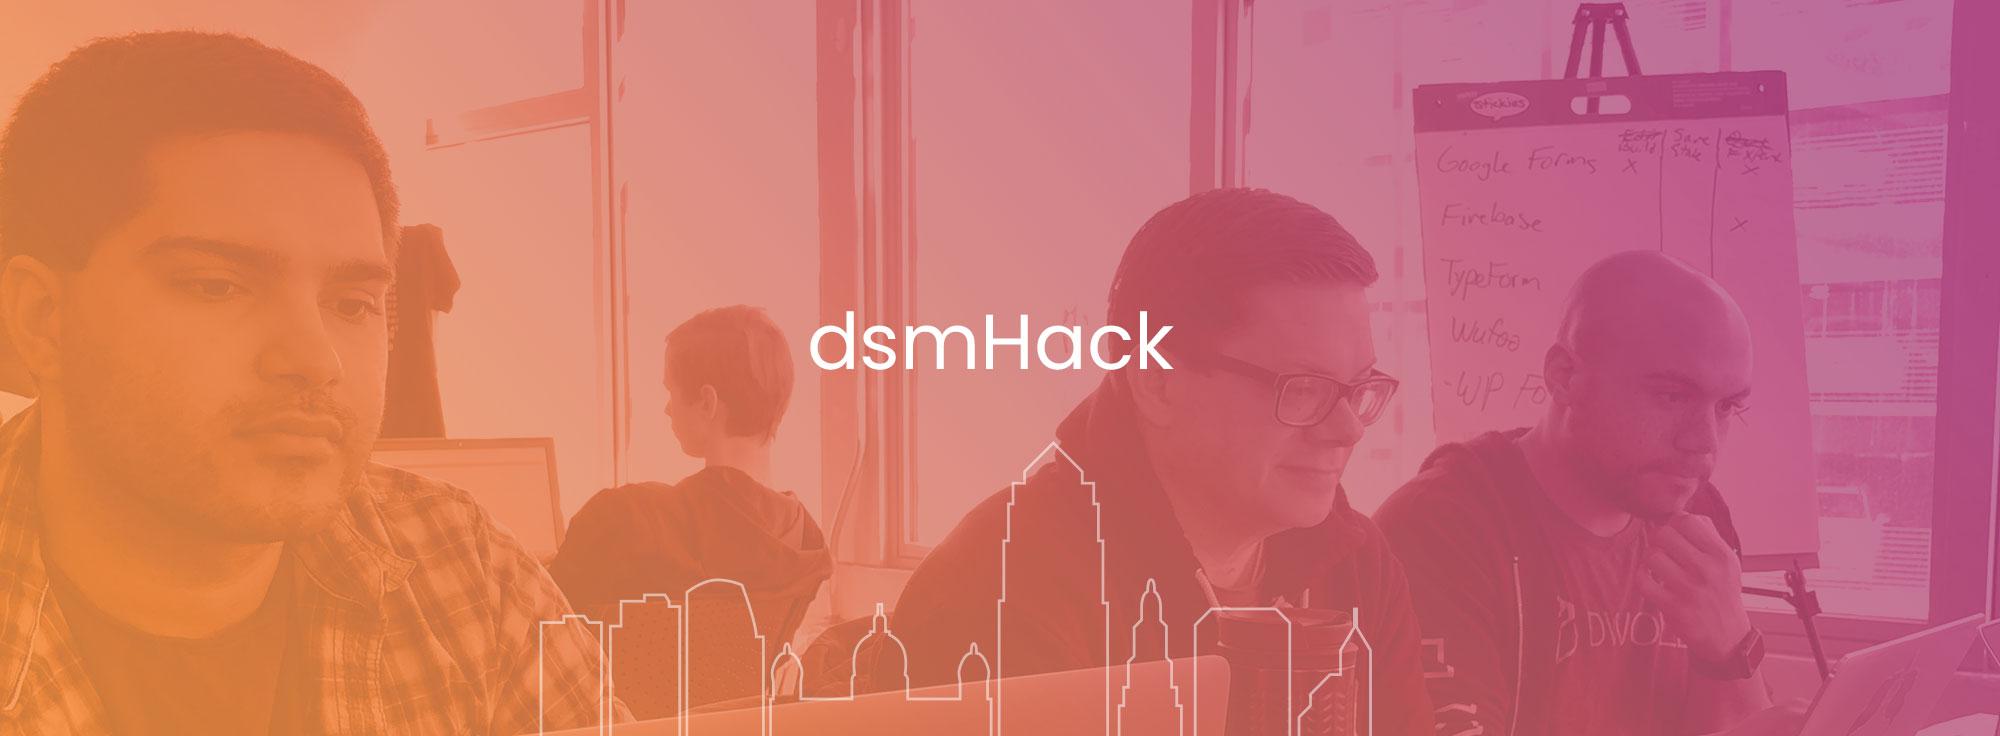 dsmHack volunteering image